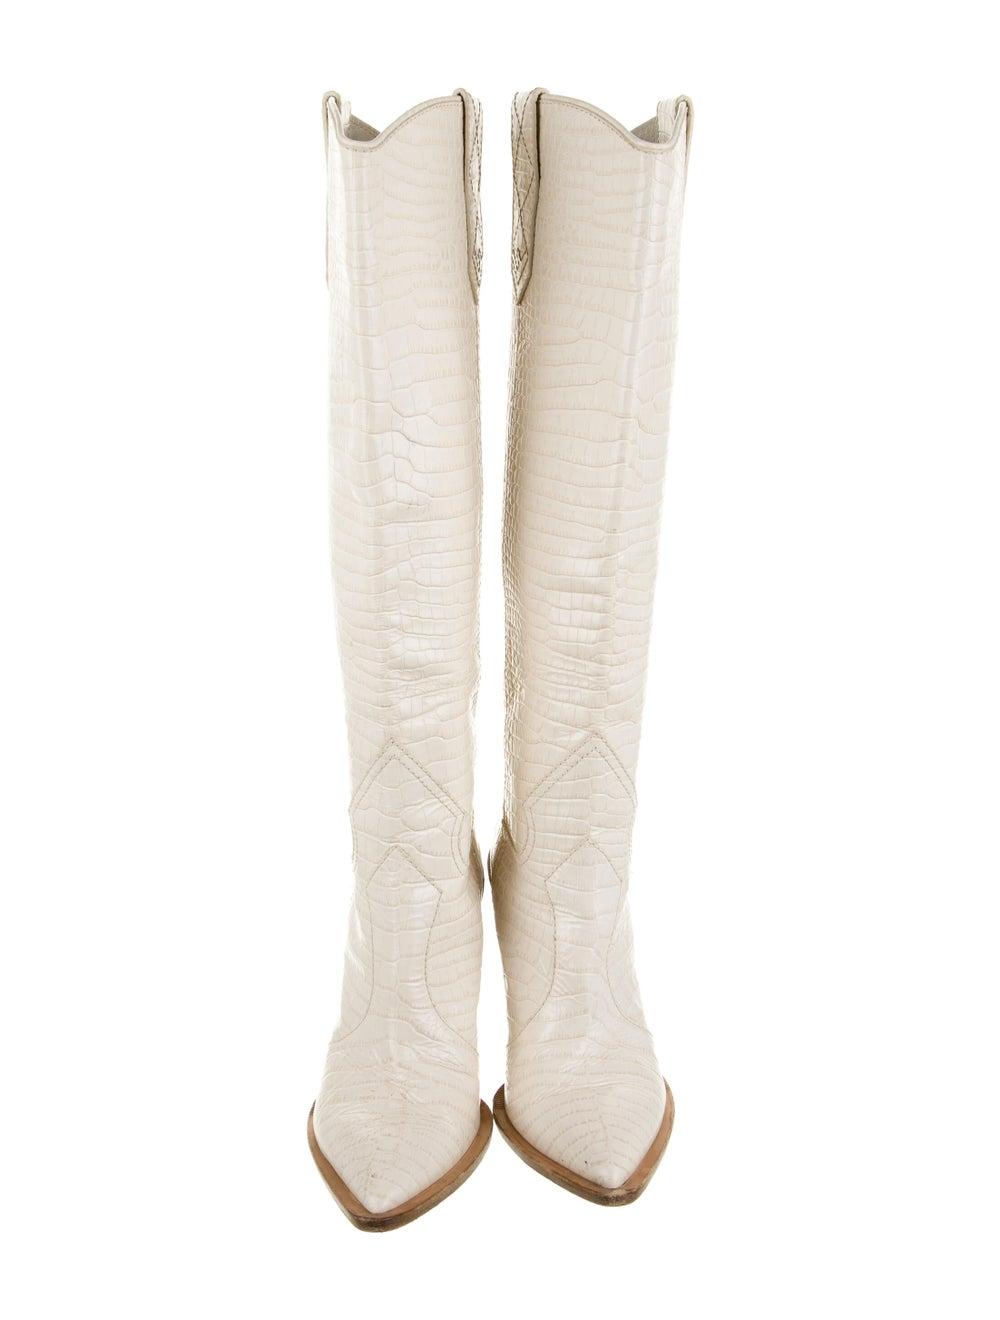 Fendi 2018 2018 Cutwalk Cowboy Embossed Boots Whi… - image 3